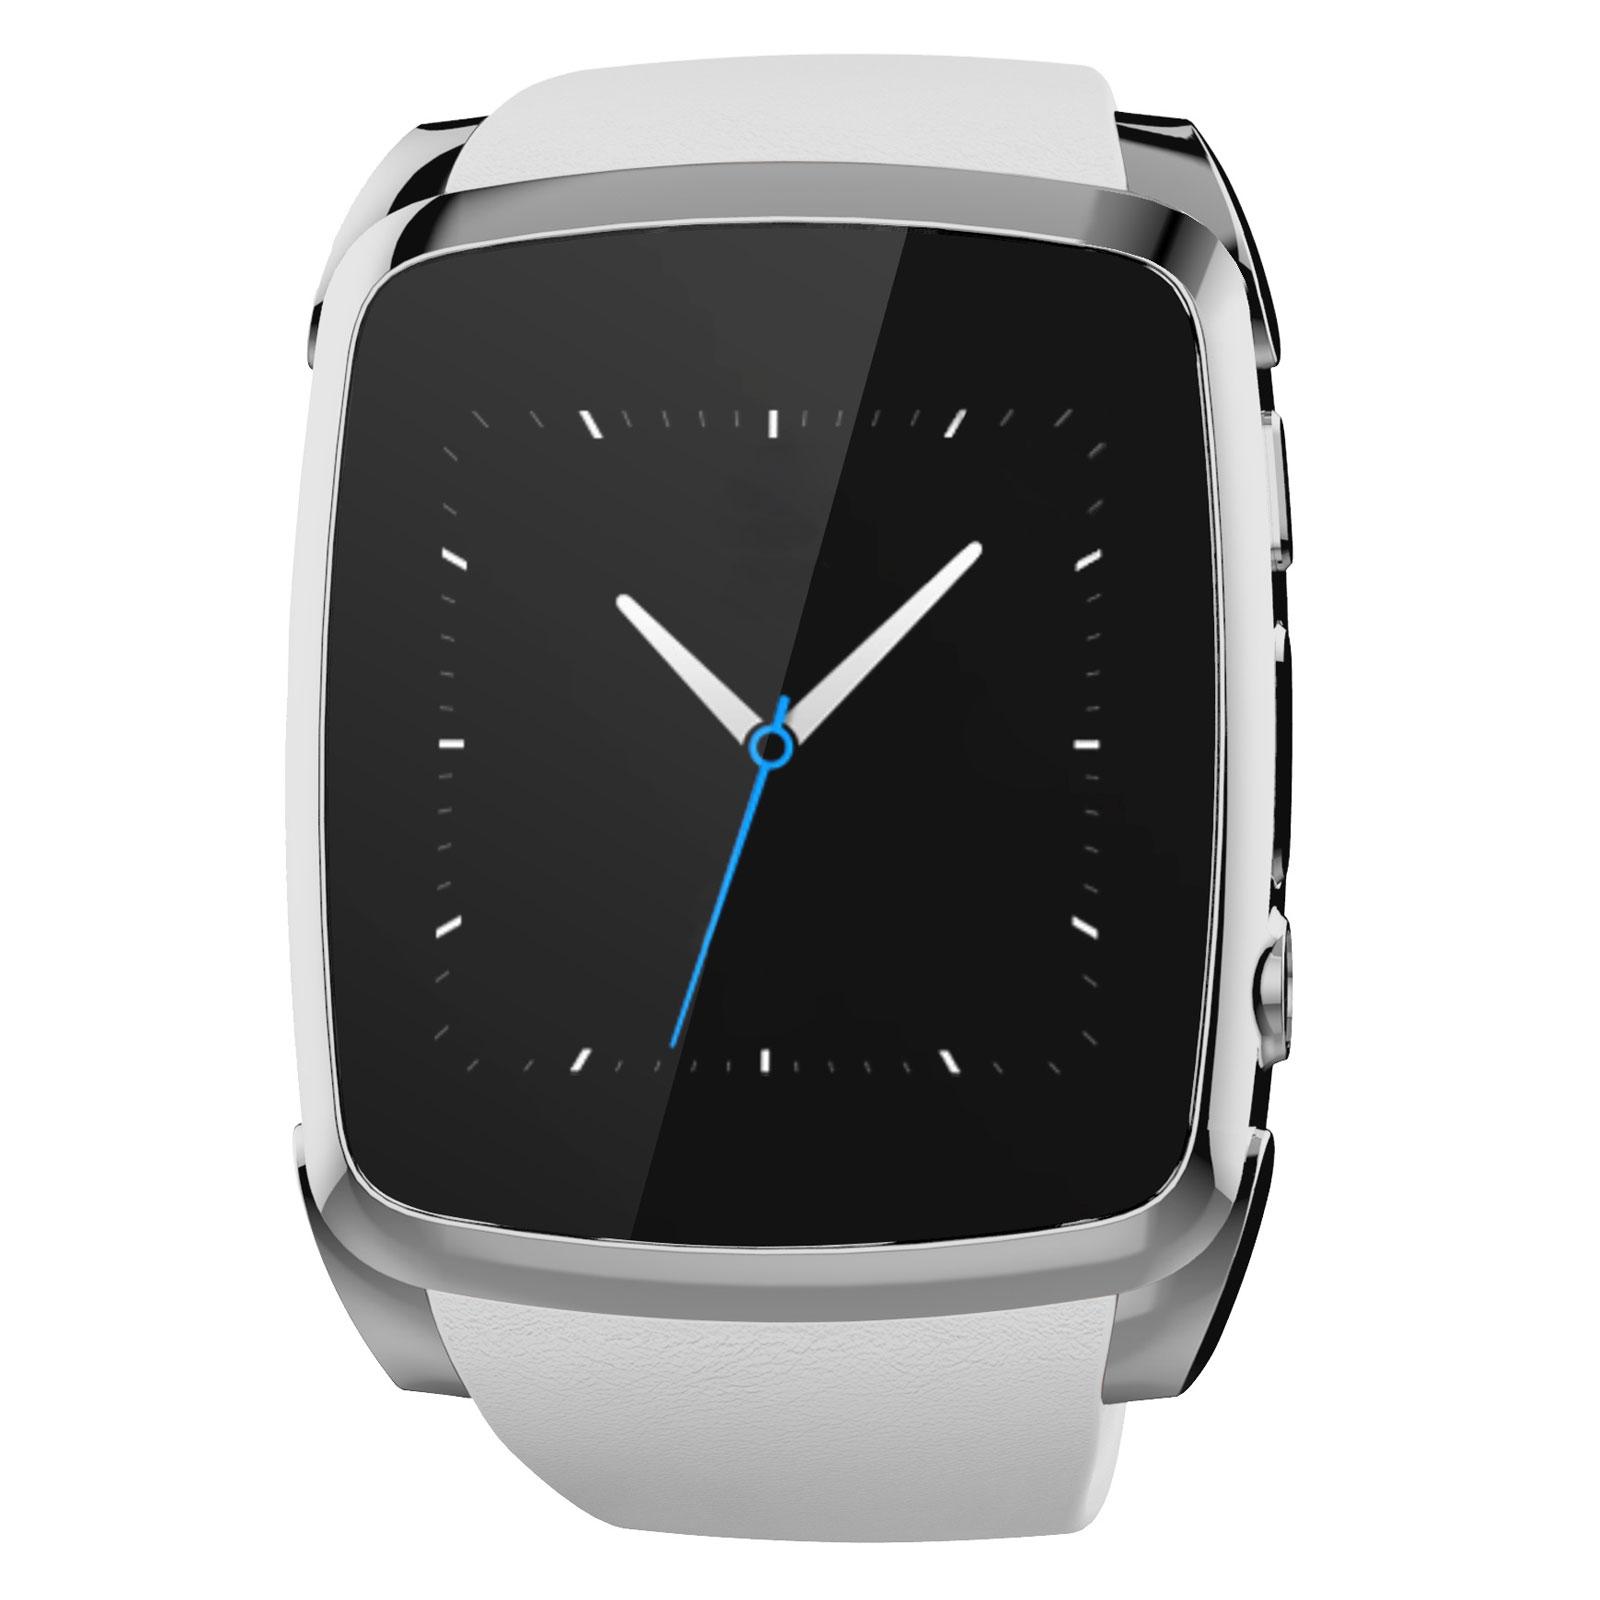 prestige smart watch blanc montre bracelets connect s. Black Bedroom Furniture Sets. Home Design Ideas